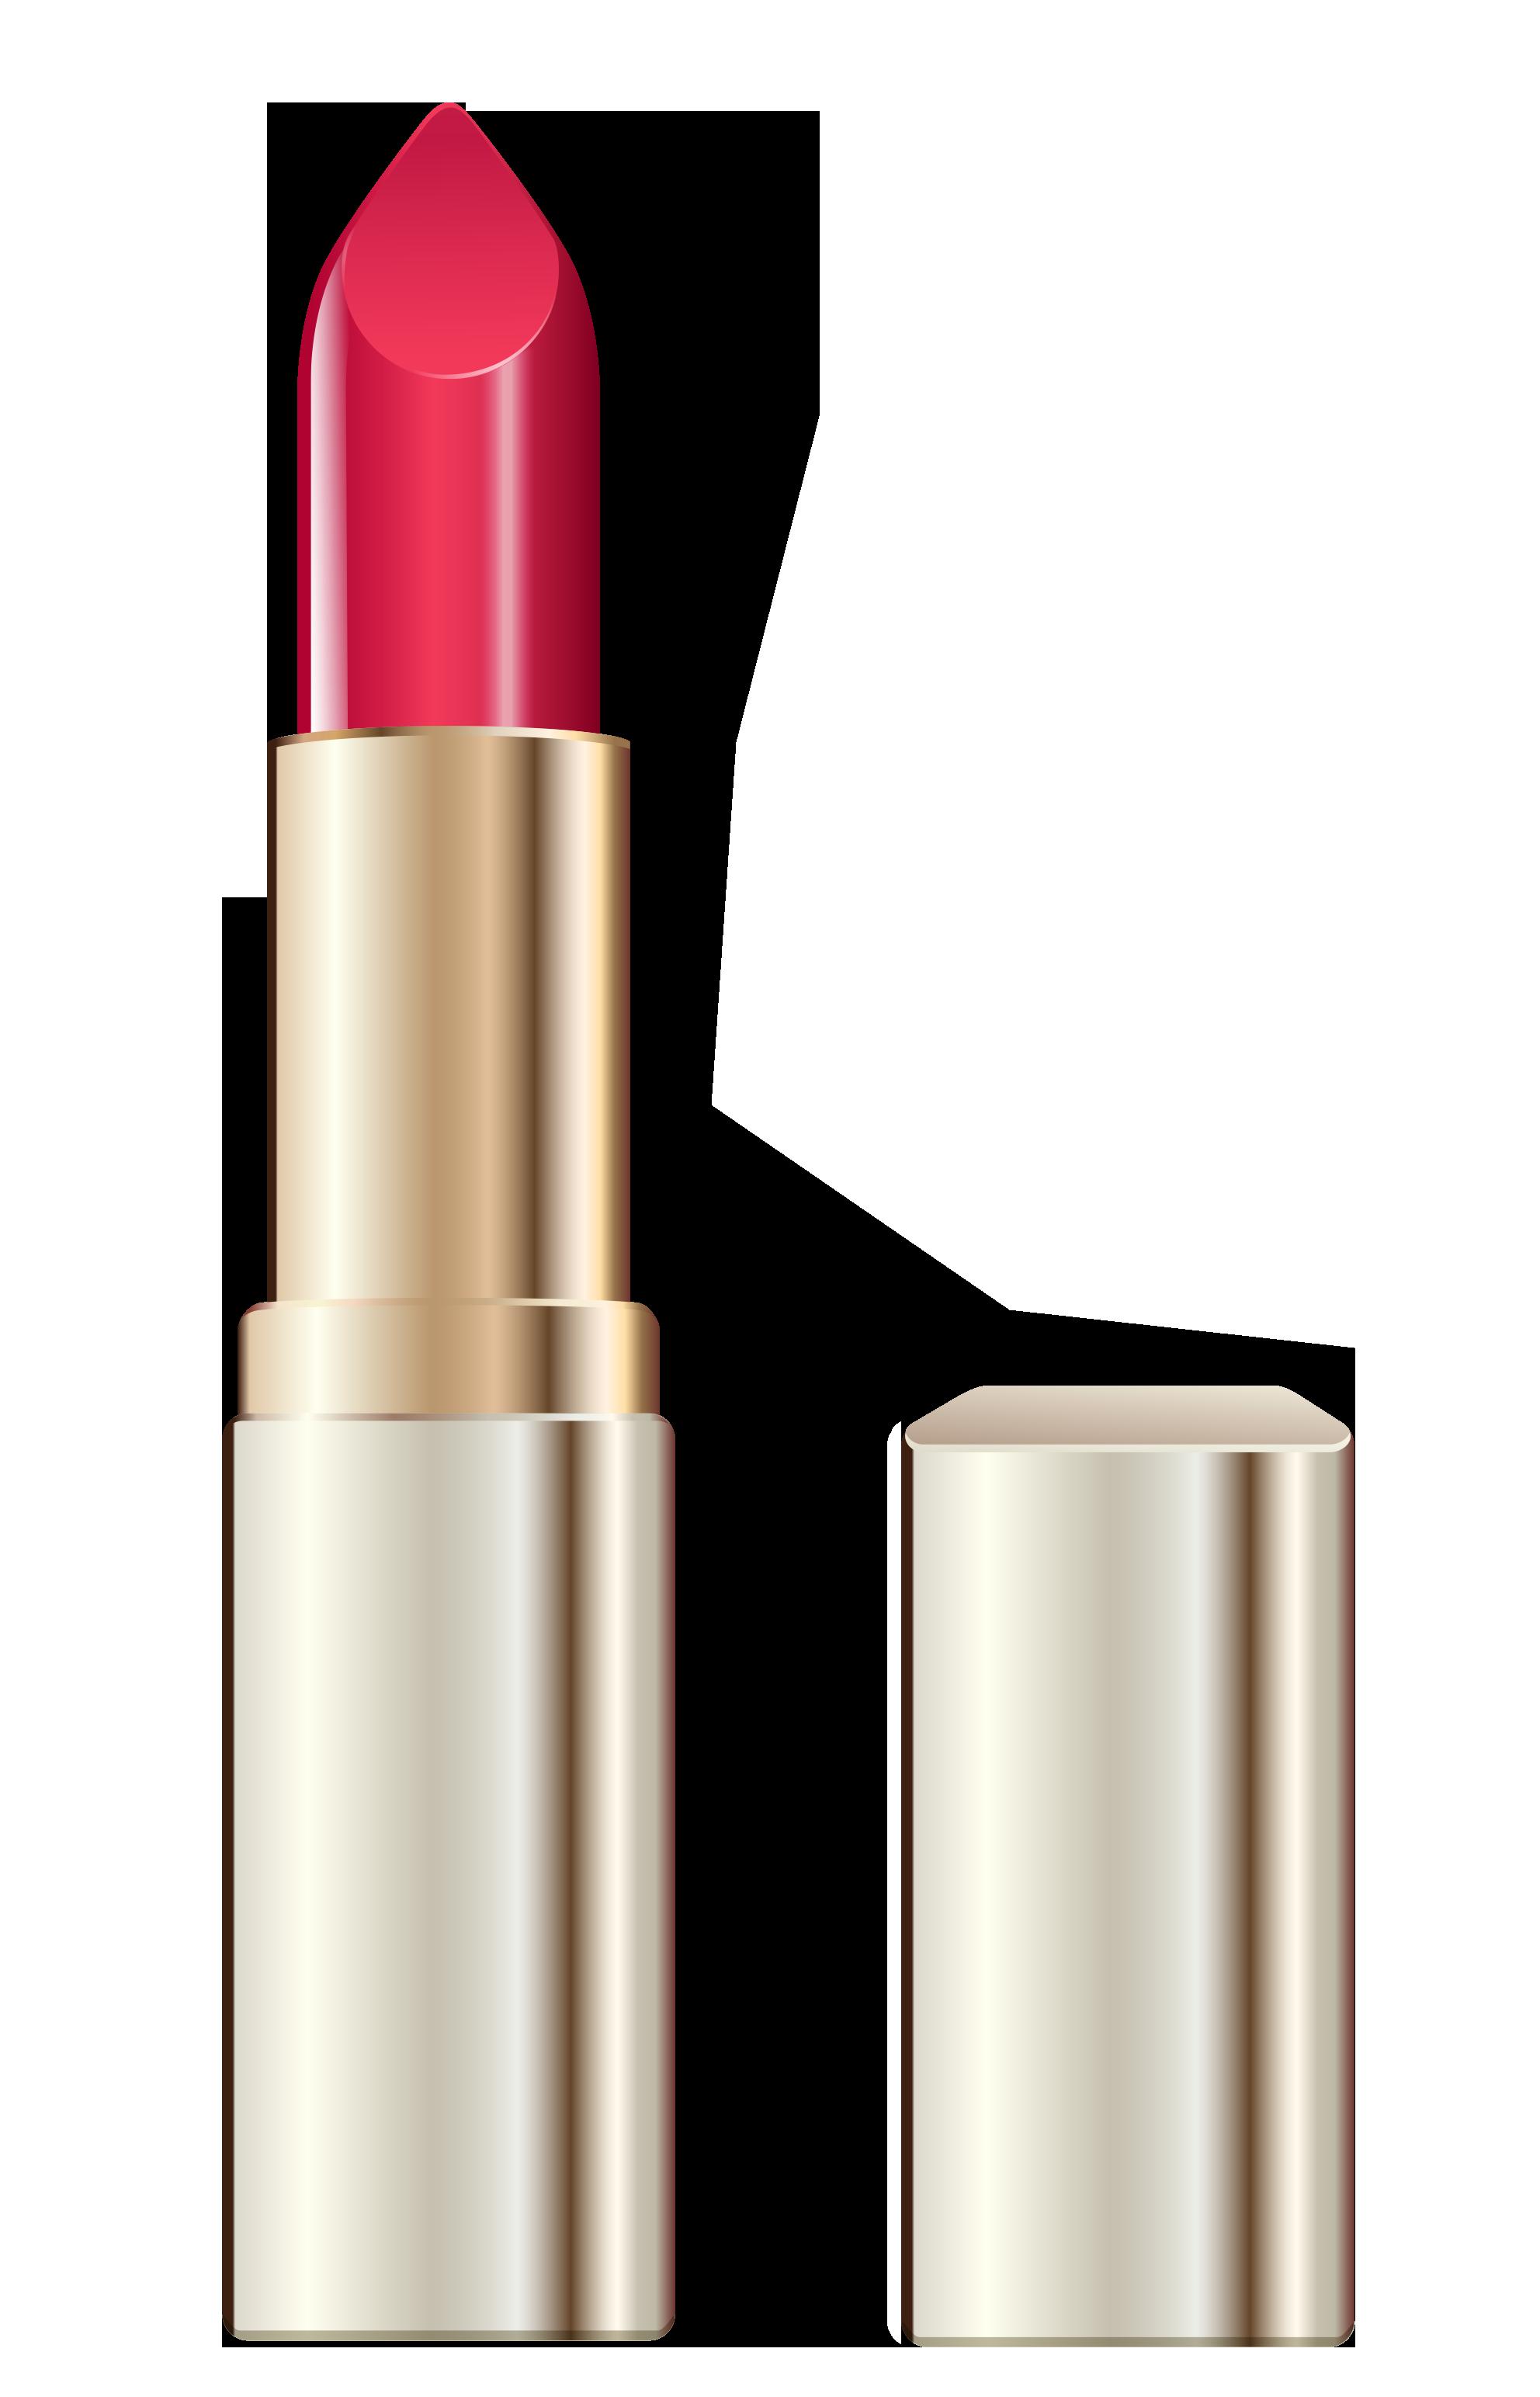 Pink Lipstick Png Clipart Picture Lipstick Pink Lipstick Free Clip Art